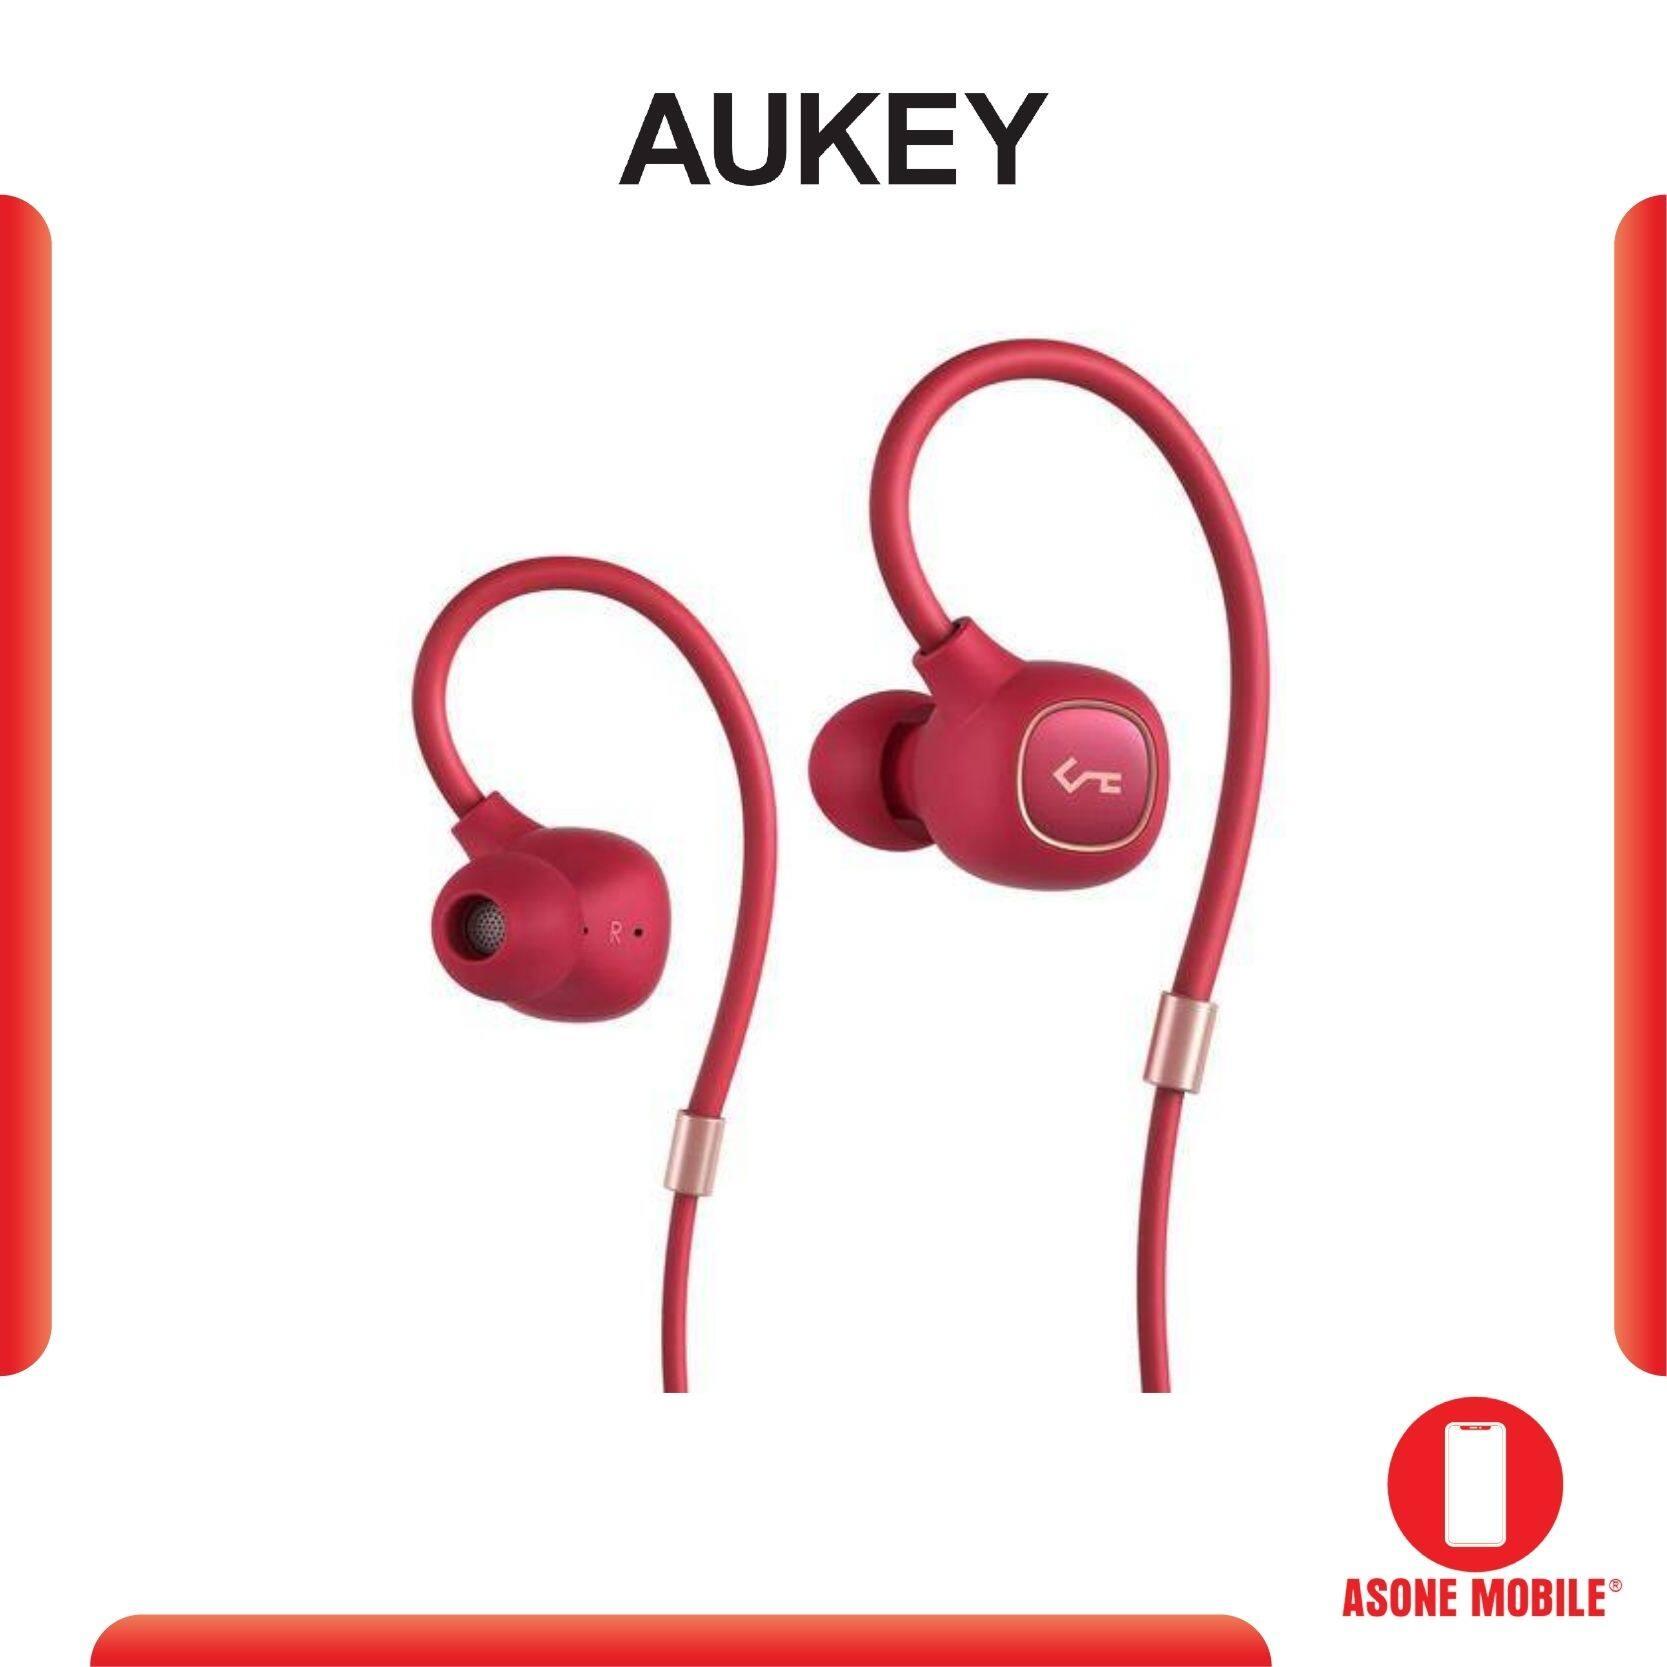 Original Aukey EP-B80 Key Series Bluetooth 5.0 Hybrid Dual Driver aptX Wireless Headphones Earbuds